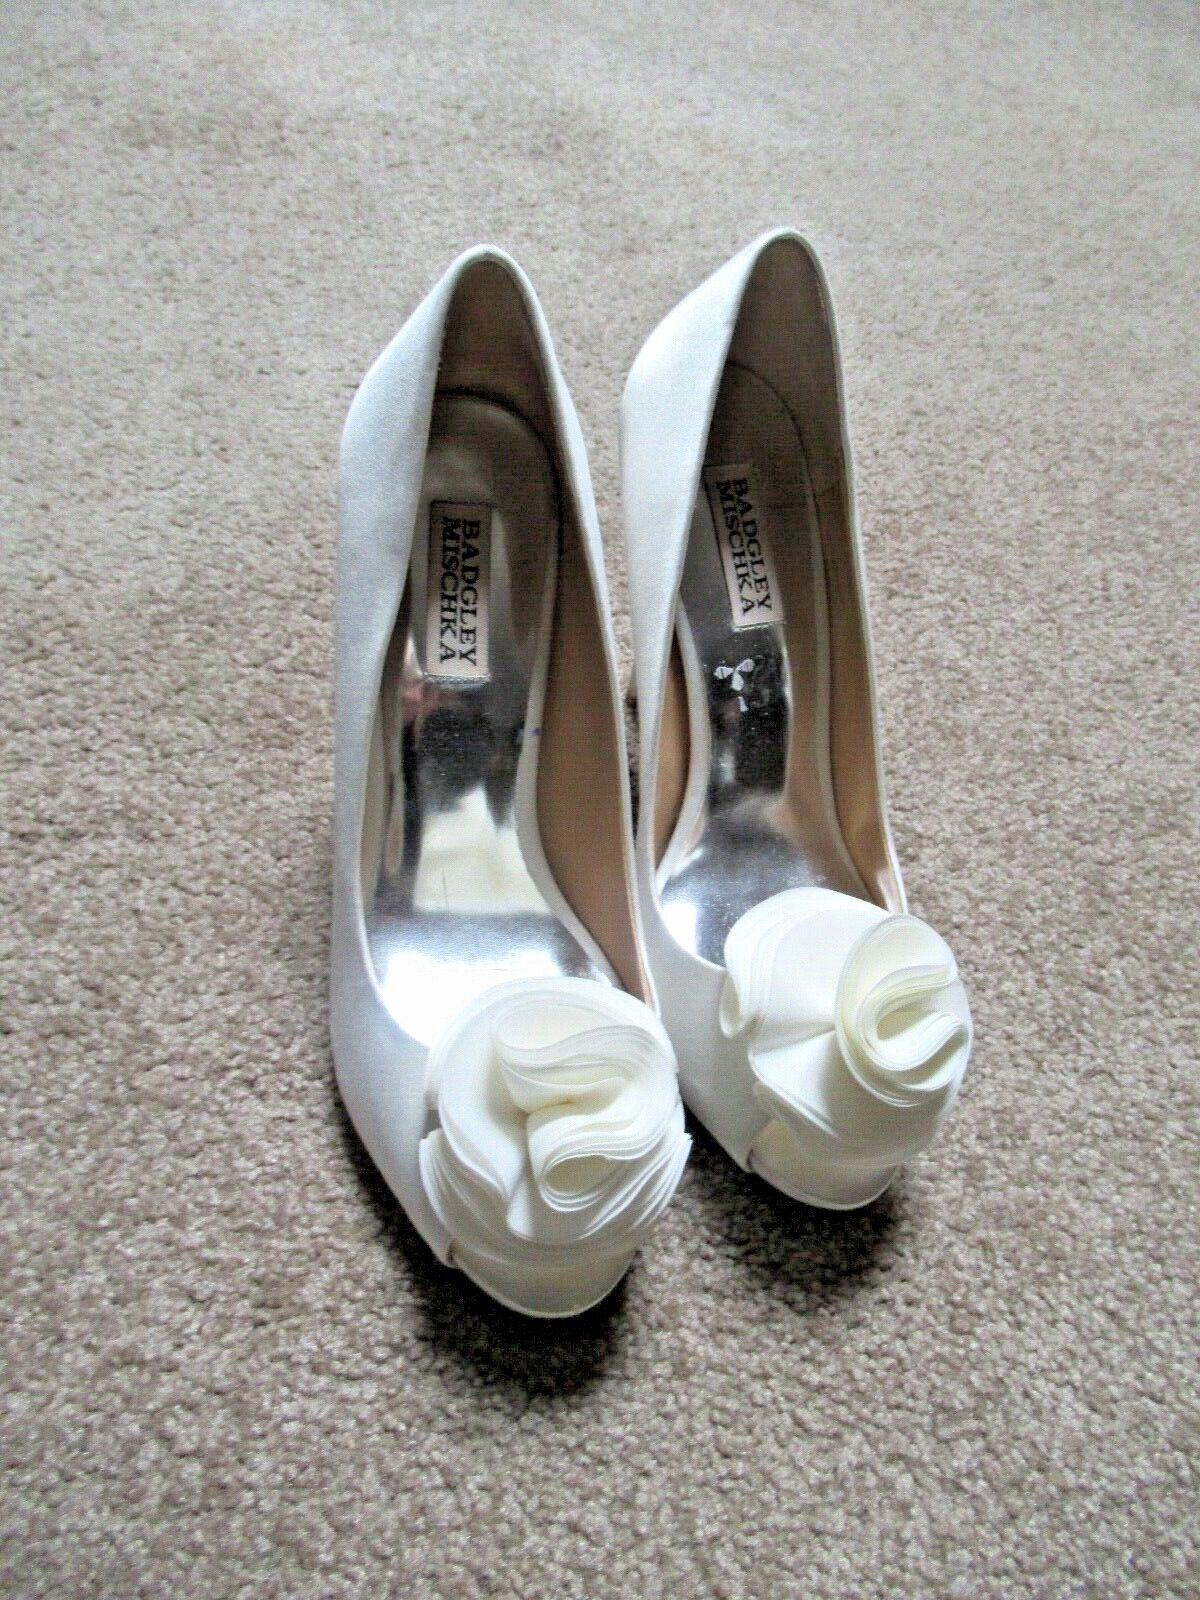 BADGLEY MISCKA vit Silk Stiletto klackar bröllop bröllop bröllop skor Sz 8  2 Floral Peep tå  outlet online butik